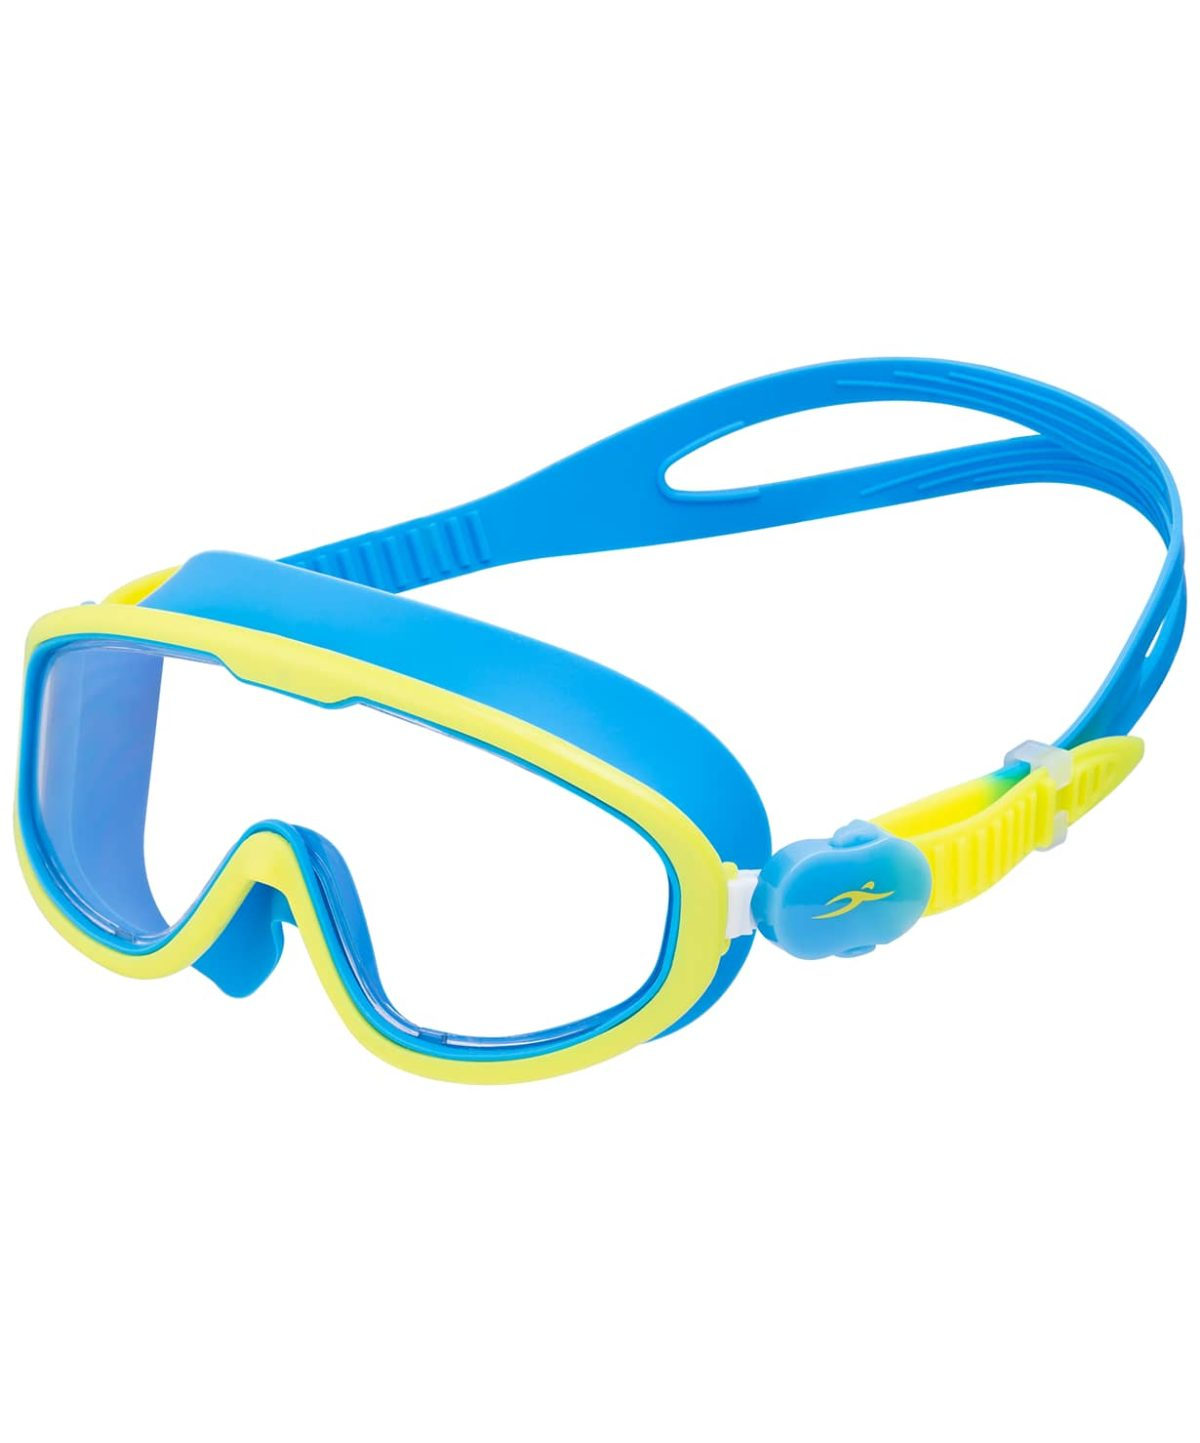 25DEGREES Очки-маска для плавания Hyper, детская  25D21018: голубой/лайм - 1